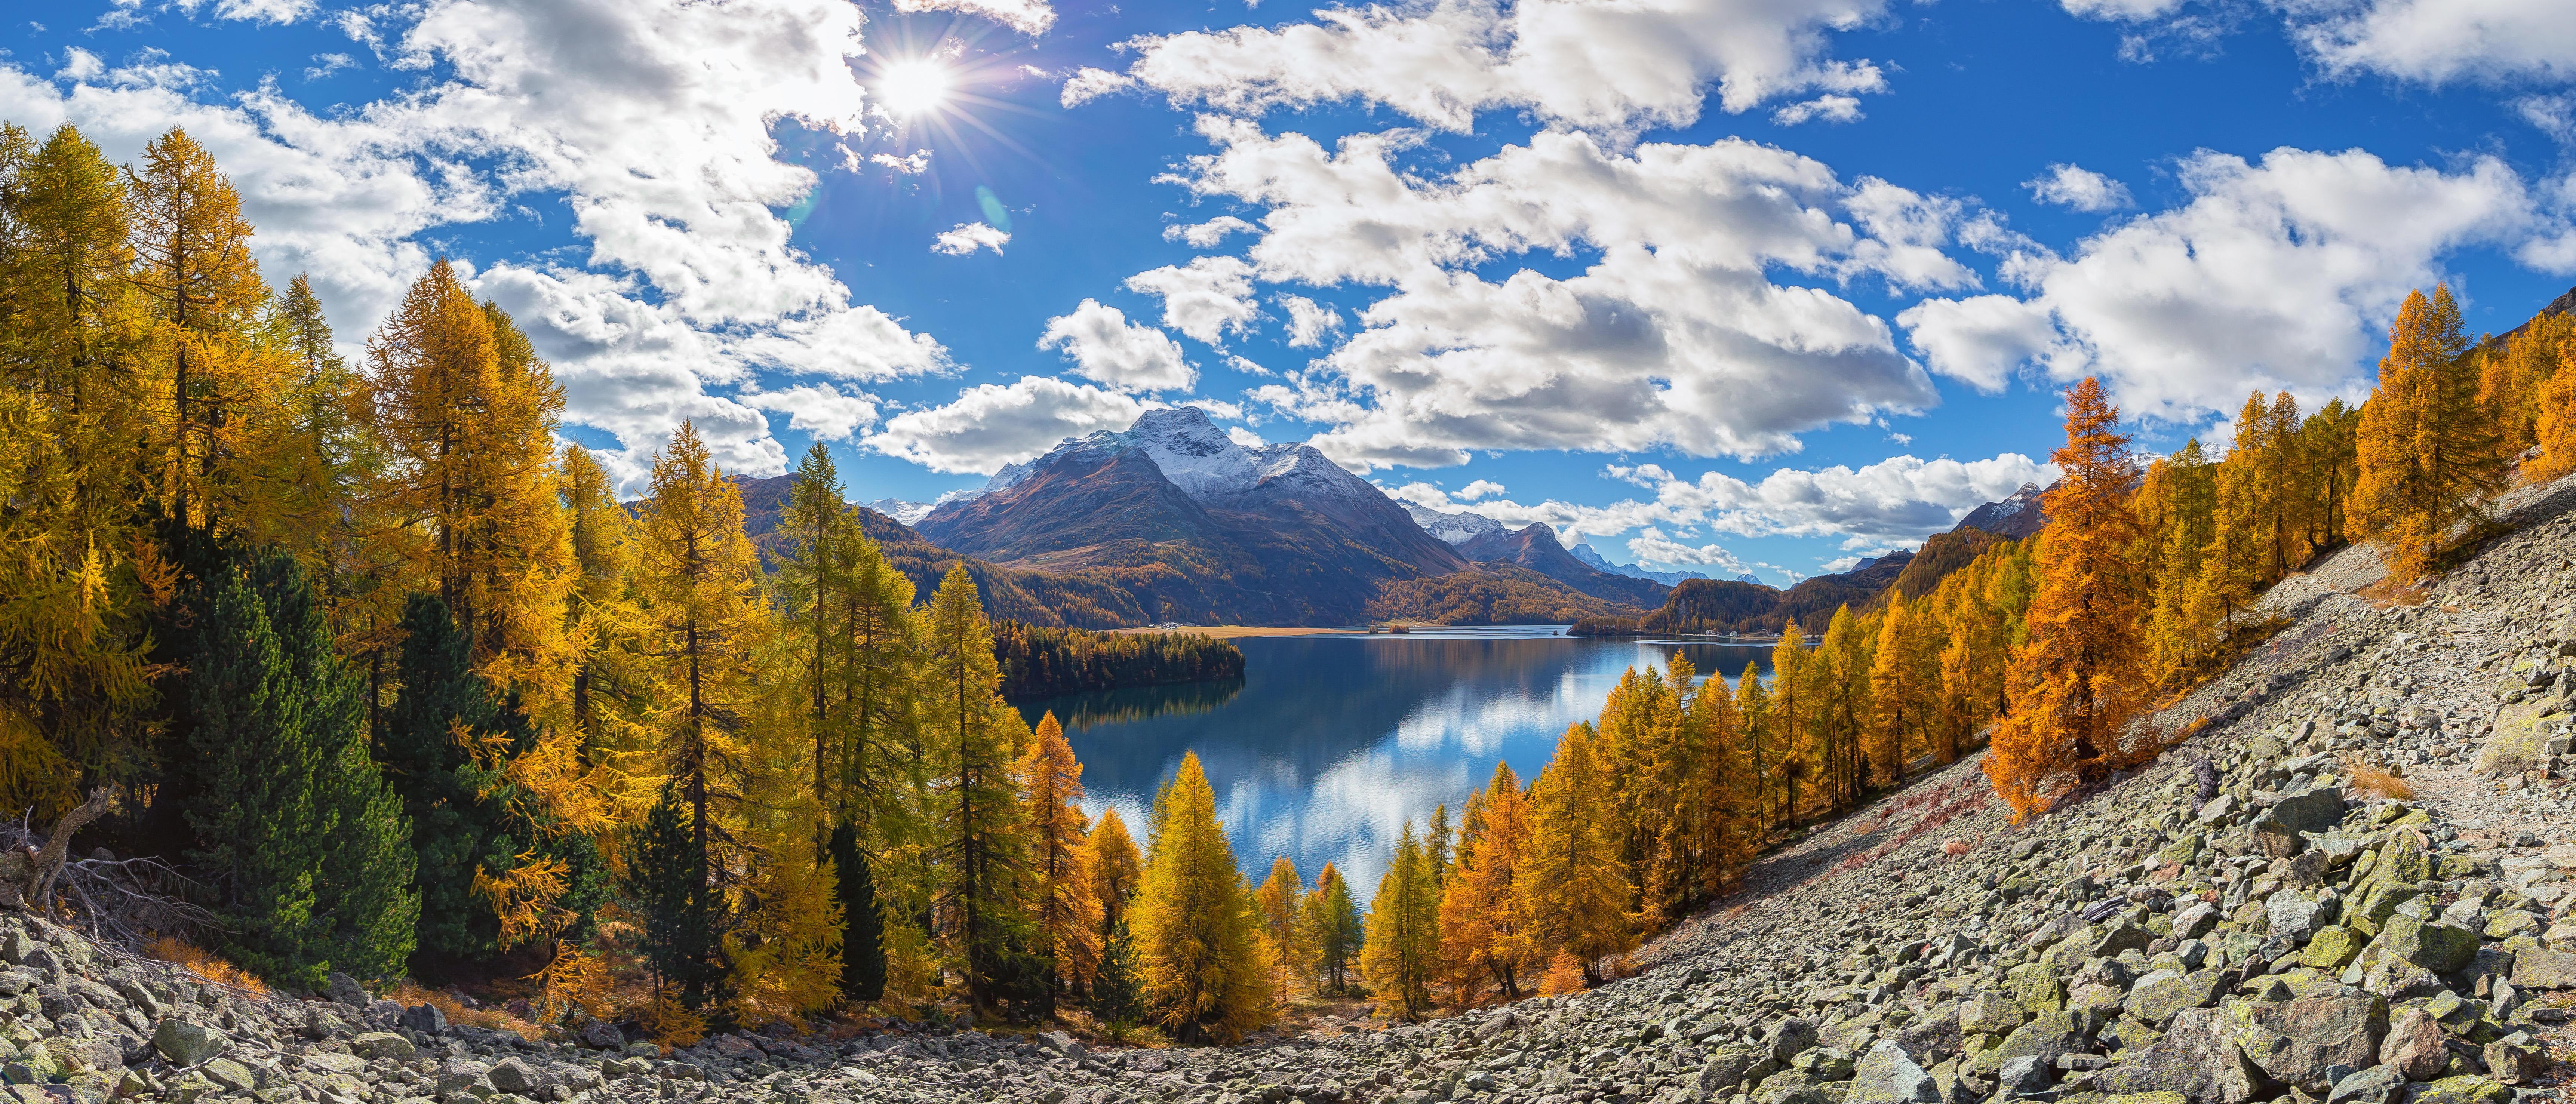 обои Граубюнден, Швейцария, панорама, осень картинки фото